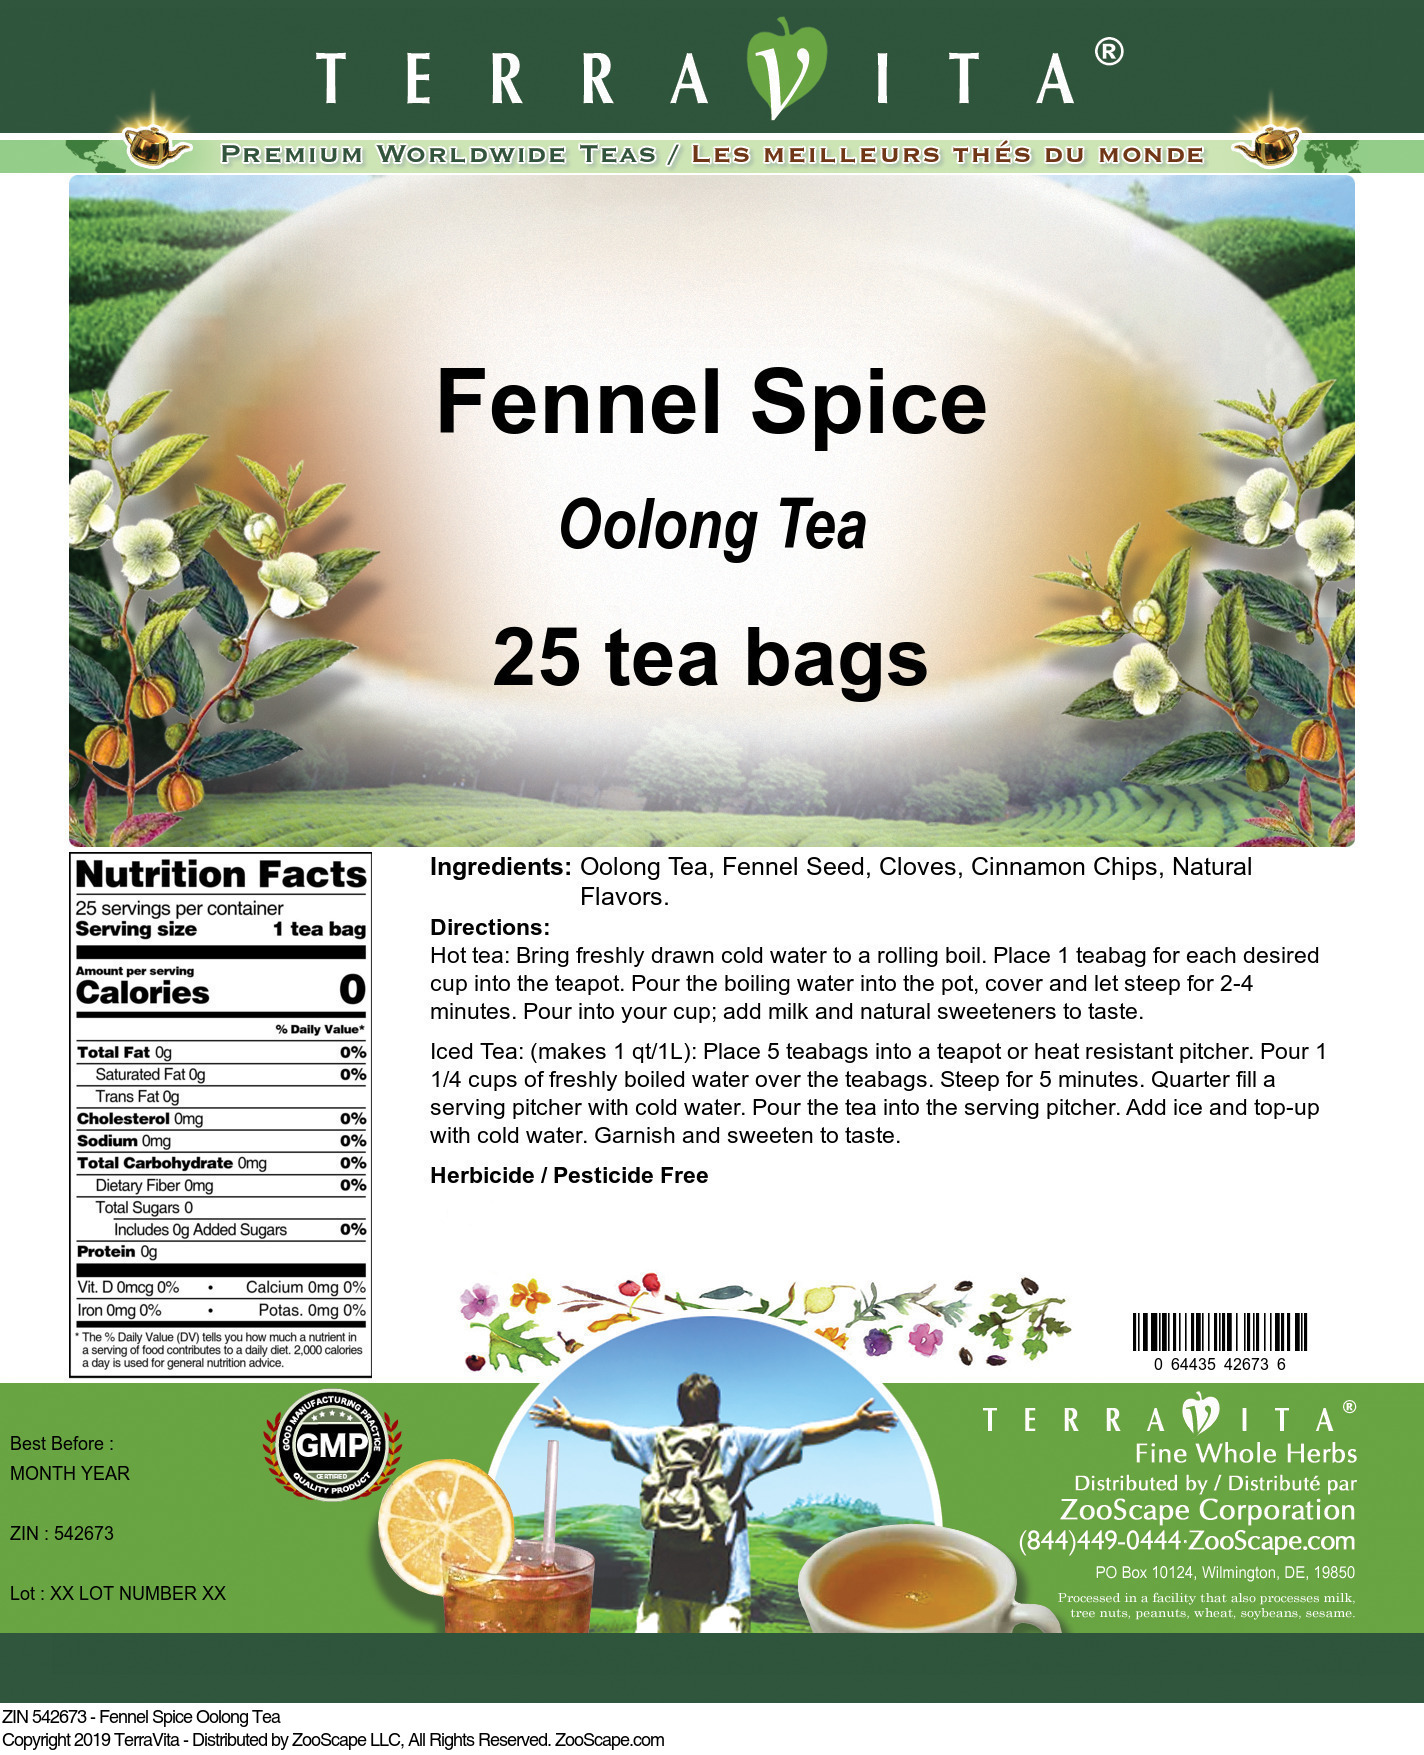 Fennel Spice Oolong Tea